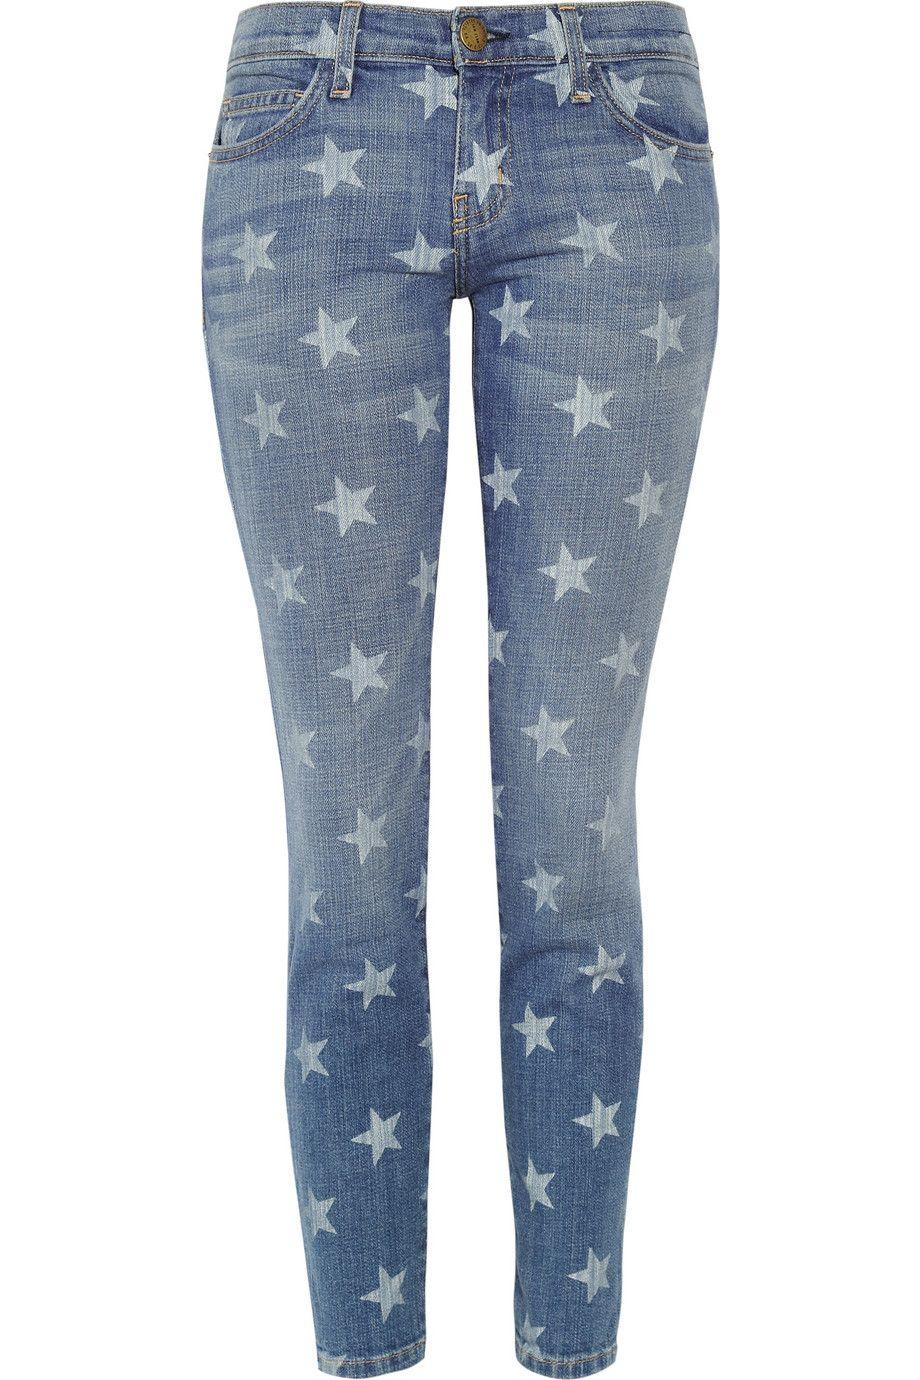 8476c0b93eae Current/Elliott | The Stiletto star-print low-rise skinny jeans |  NET-A-PORTER.COM